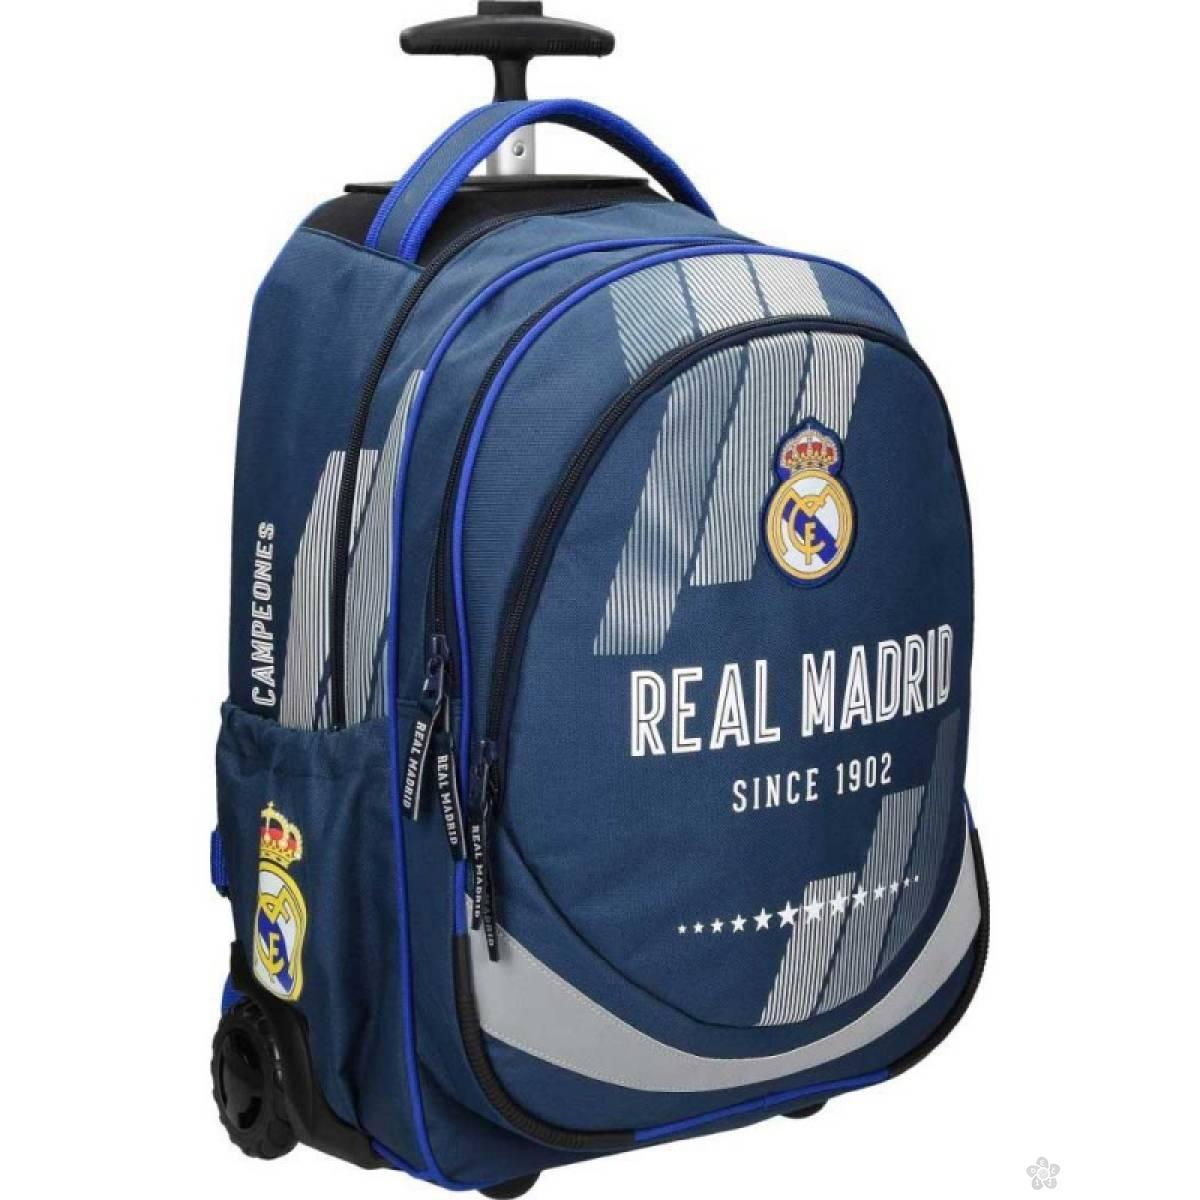 Ranac na točkiće Real Madrid 530028